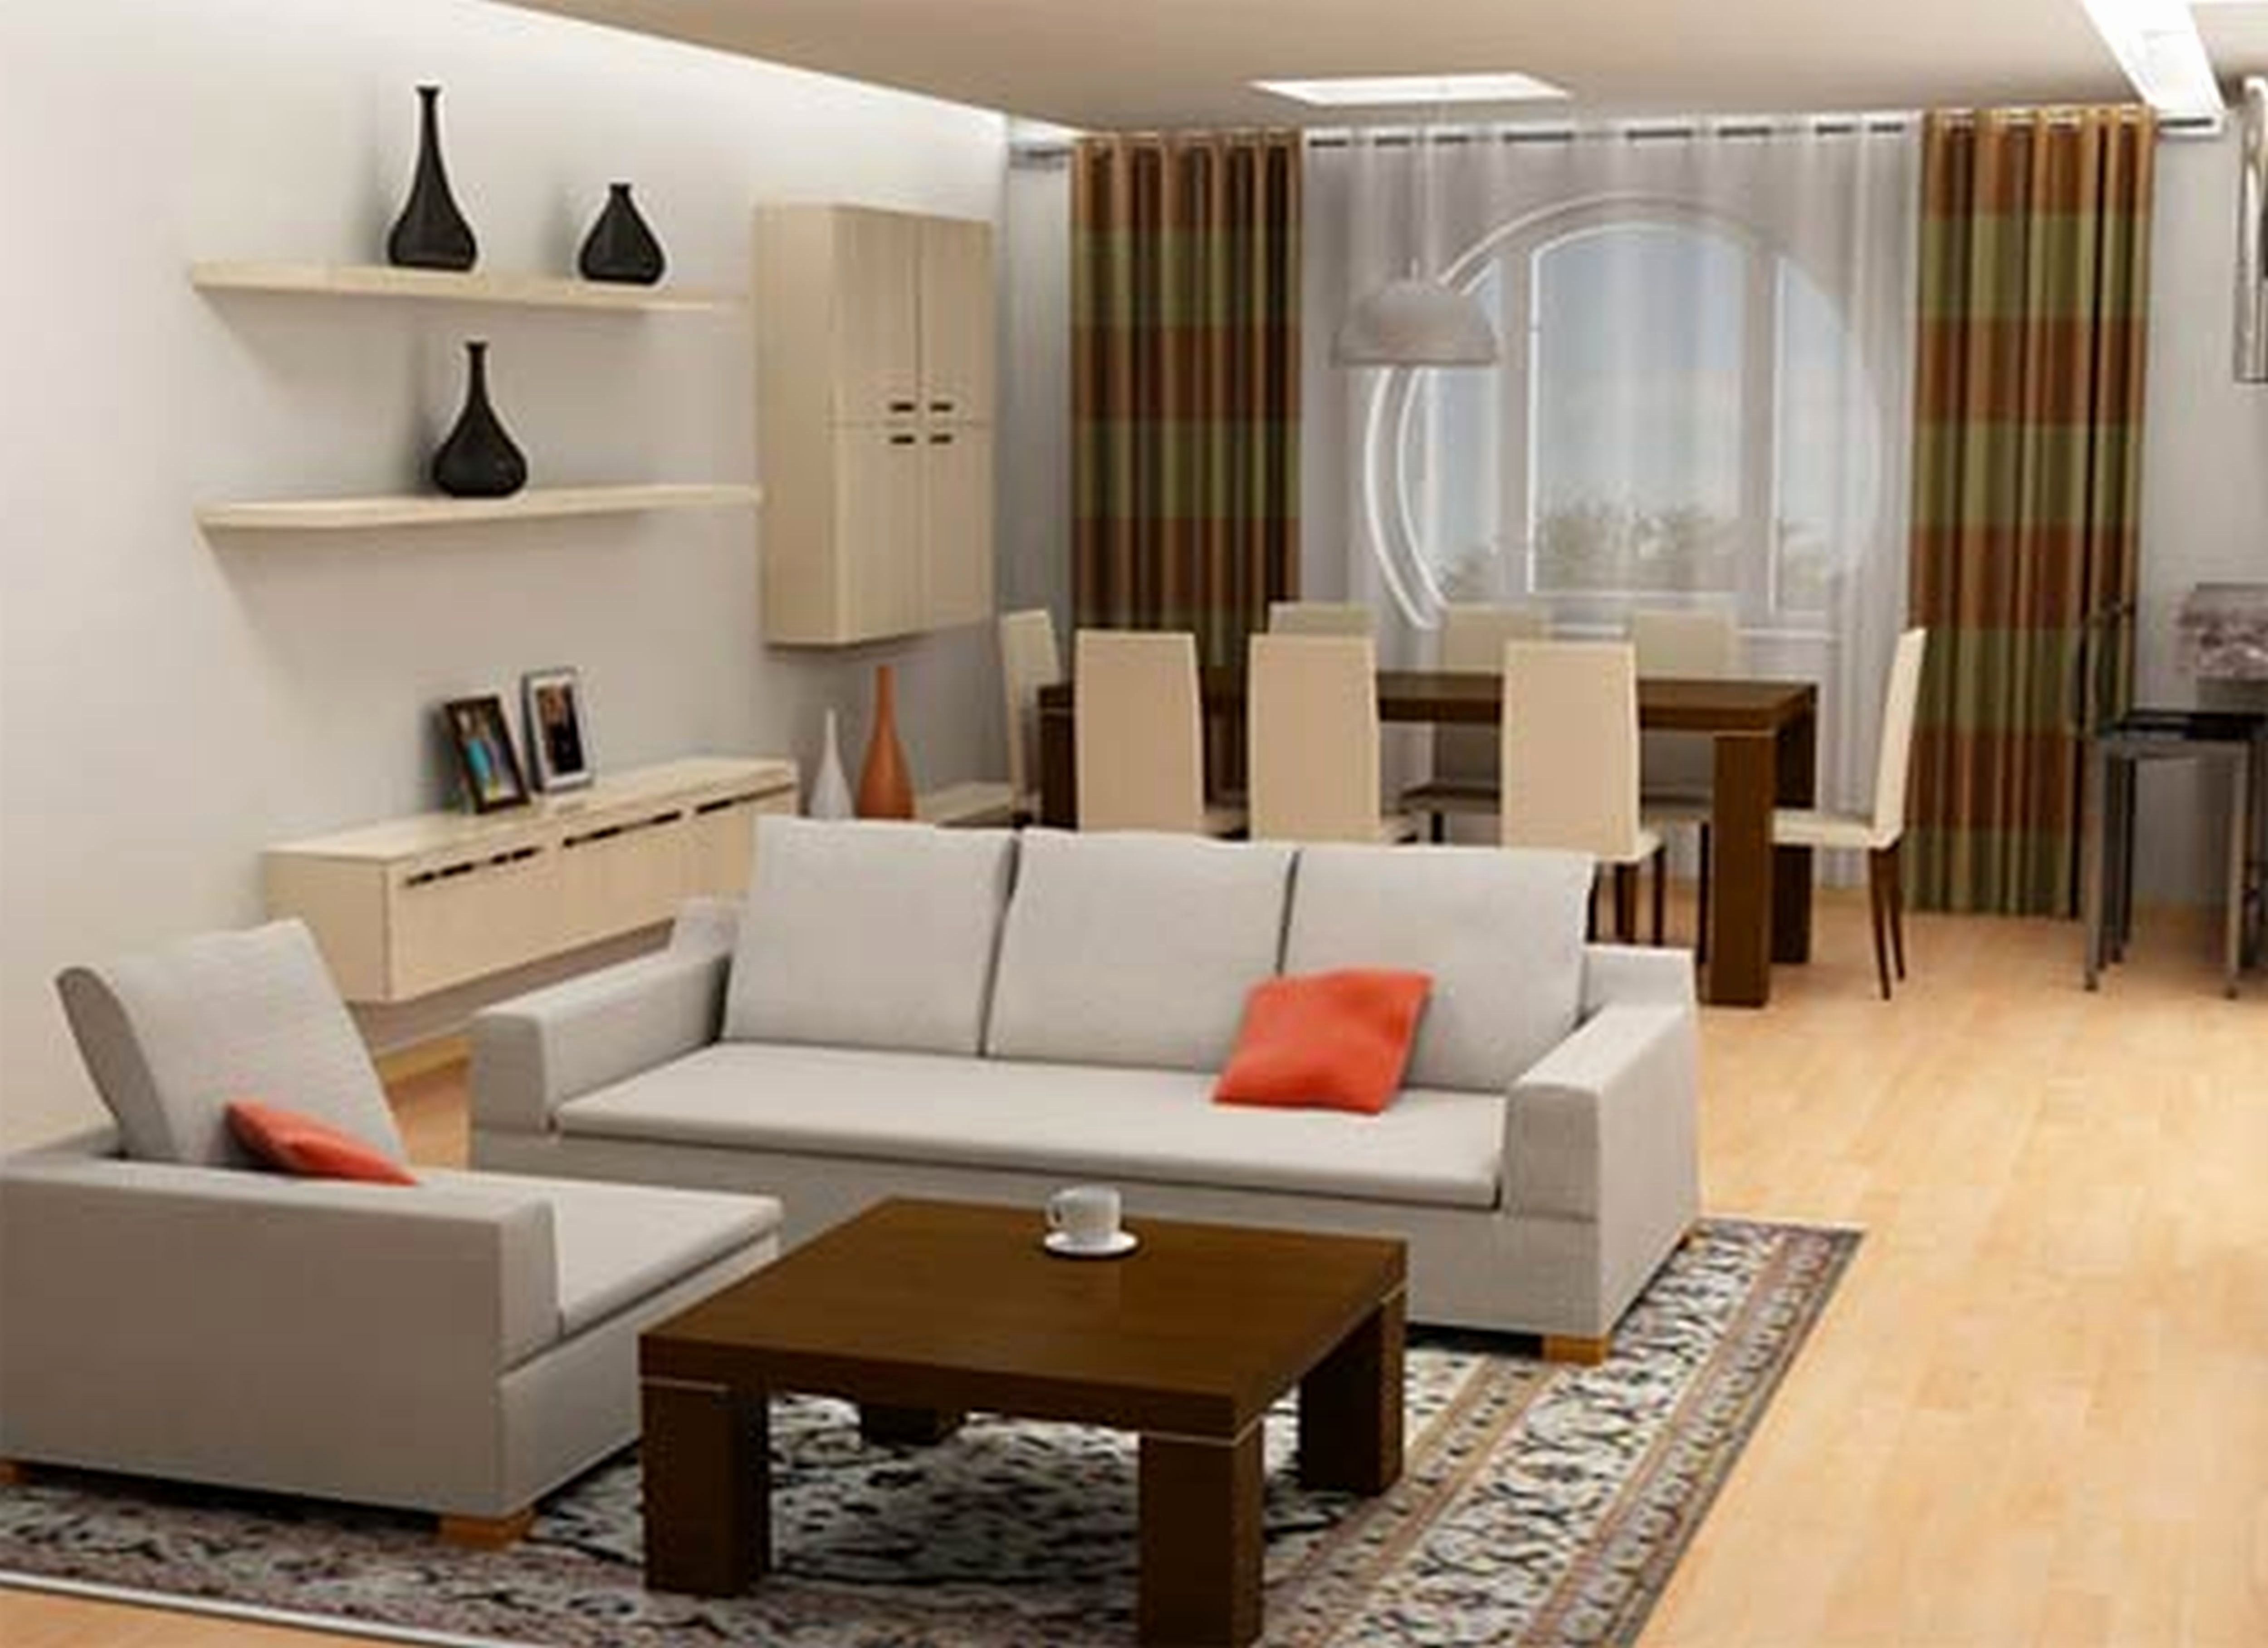 Best Of Sofa Design For Small Living Room Image Sofa Design